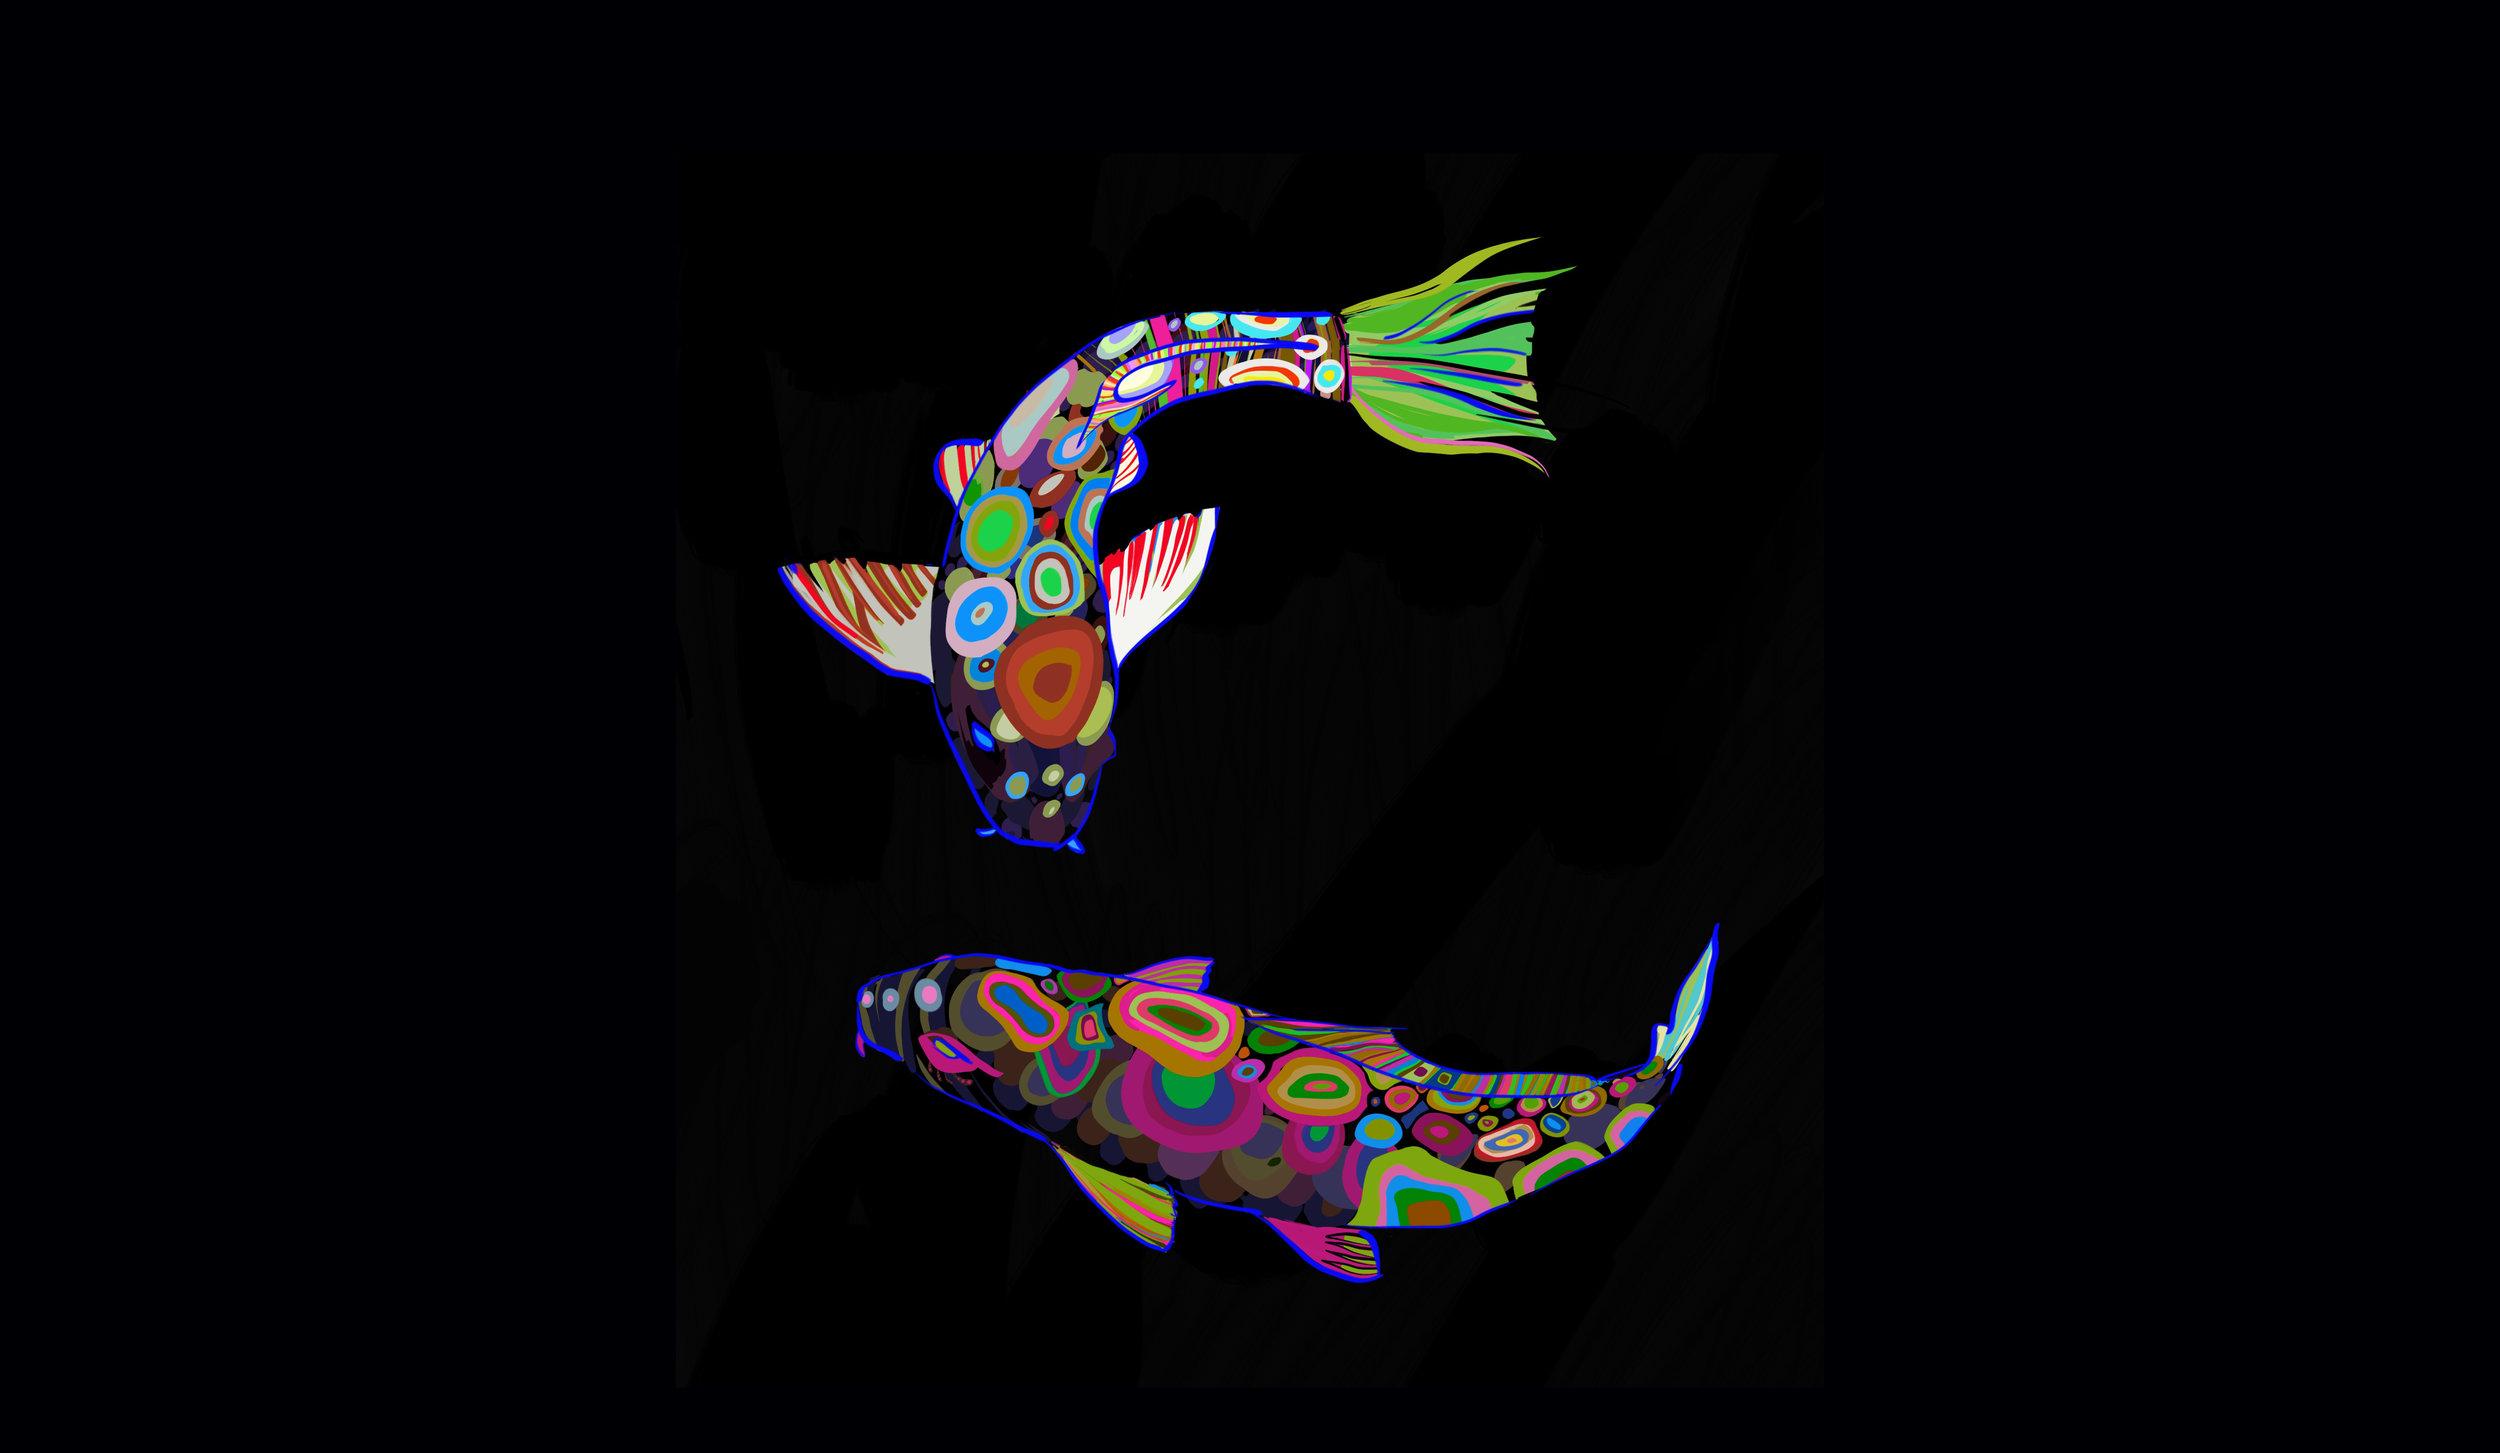 Pisces Wallpaper.jpg